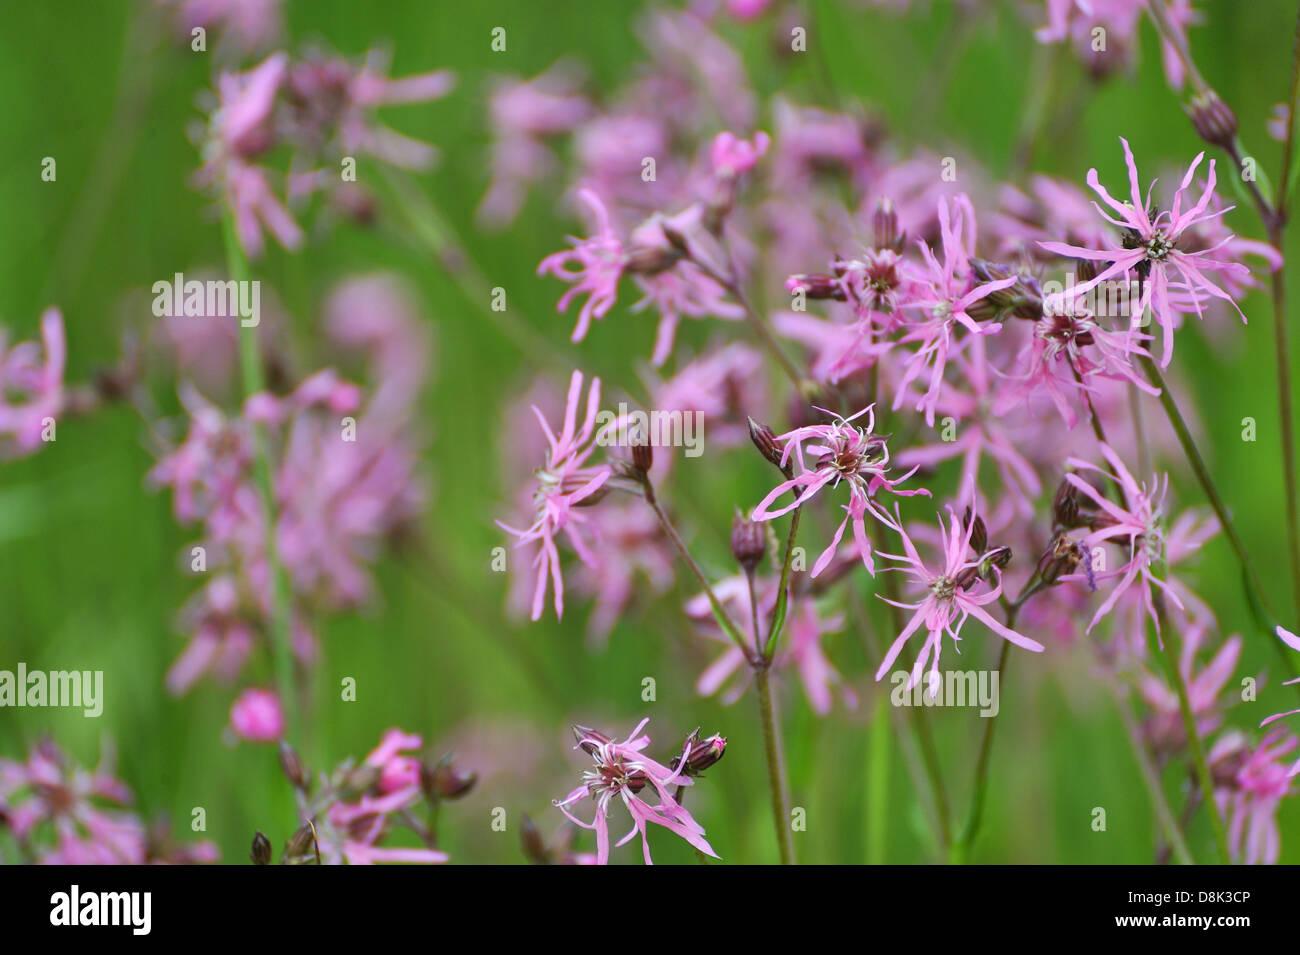 Lychnis flos-cuculi - Stock Image